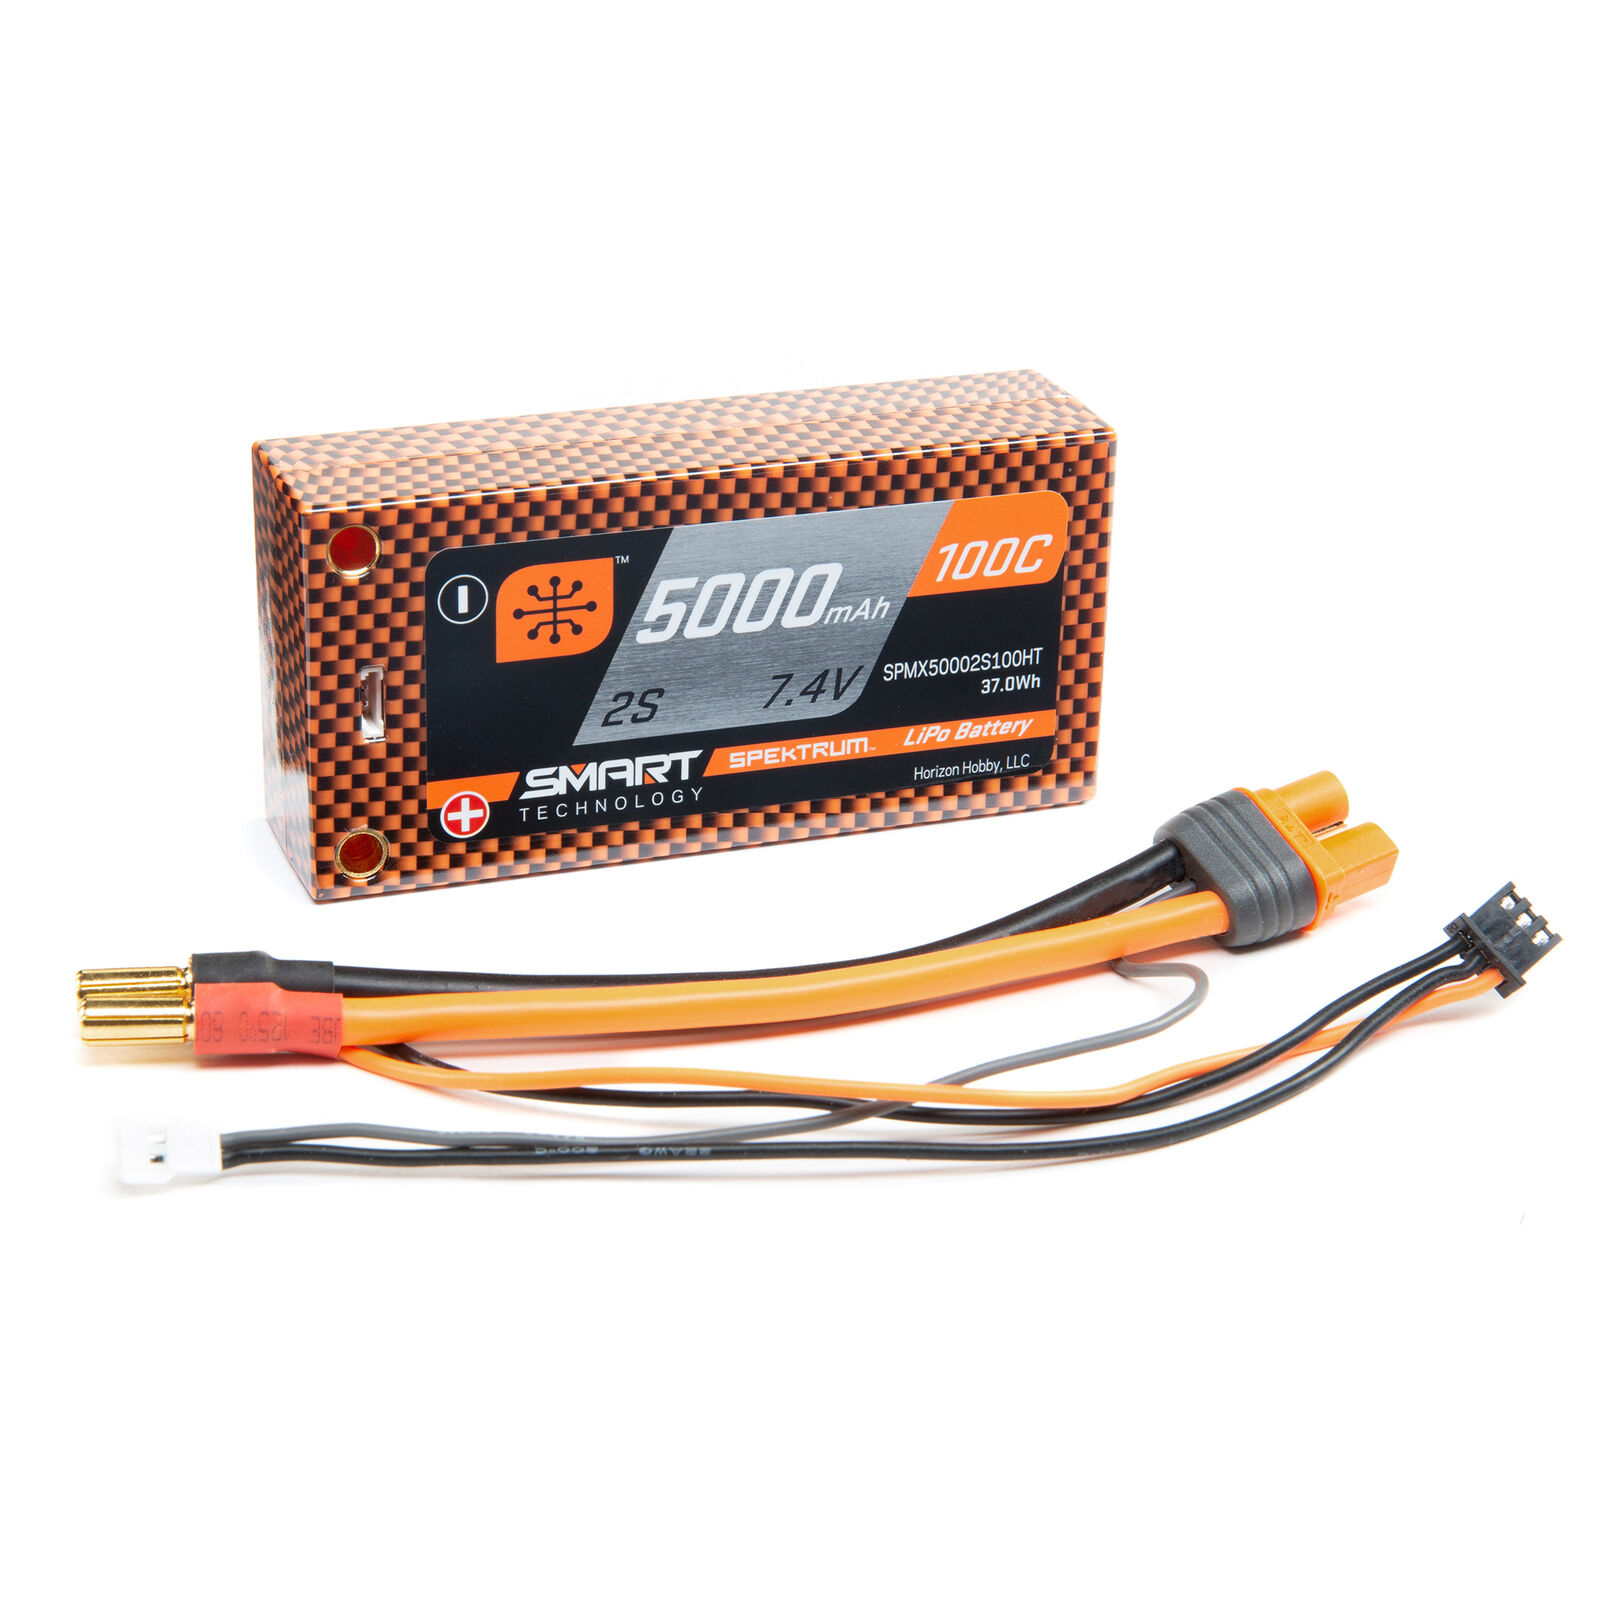 7.4V 5000mAh 2S 100C Smart Race Shorty Hardcase LiPo Battery: Tubes, 5mm